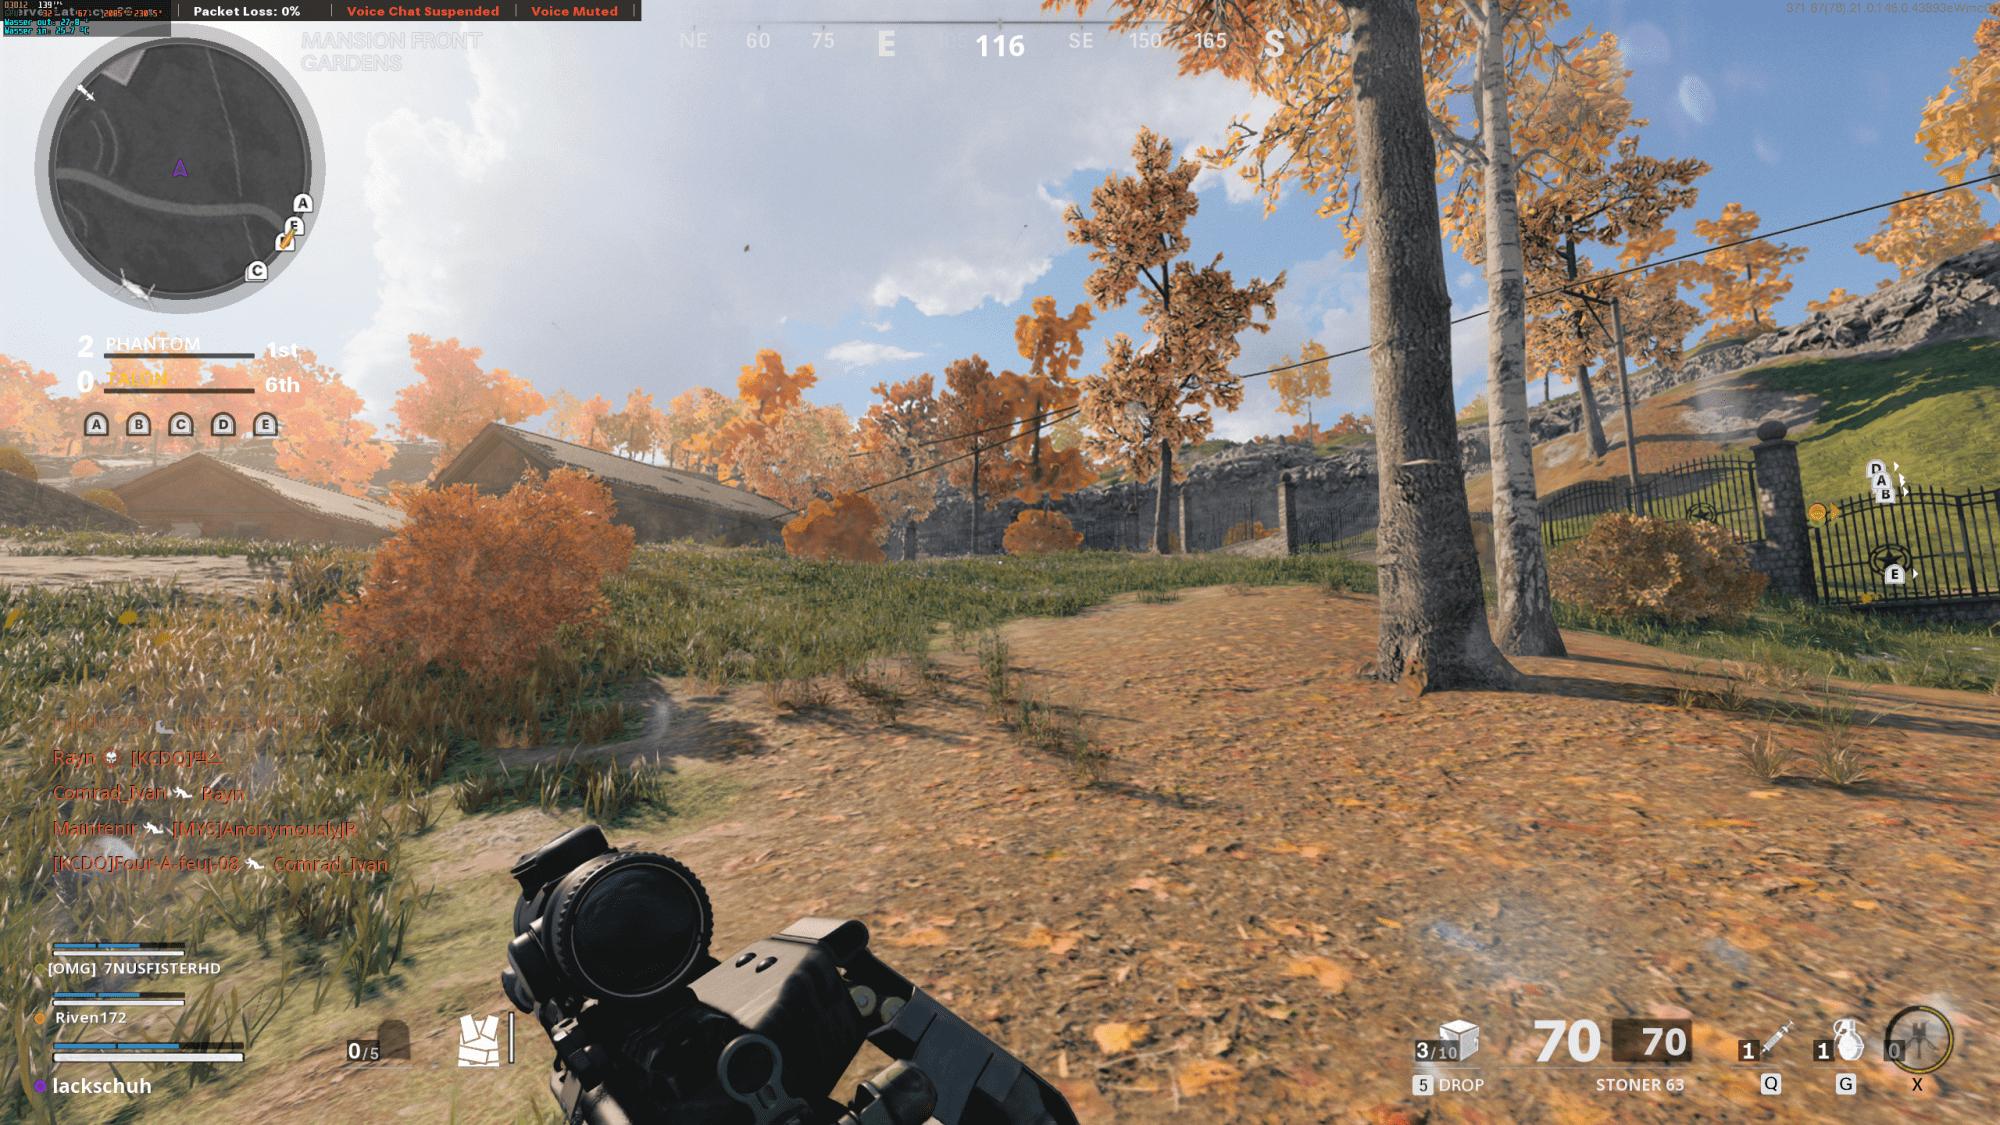 Call of Duty  Black Ops Cold War Screenshot 2021.05.04 - 12.42.51.100.png